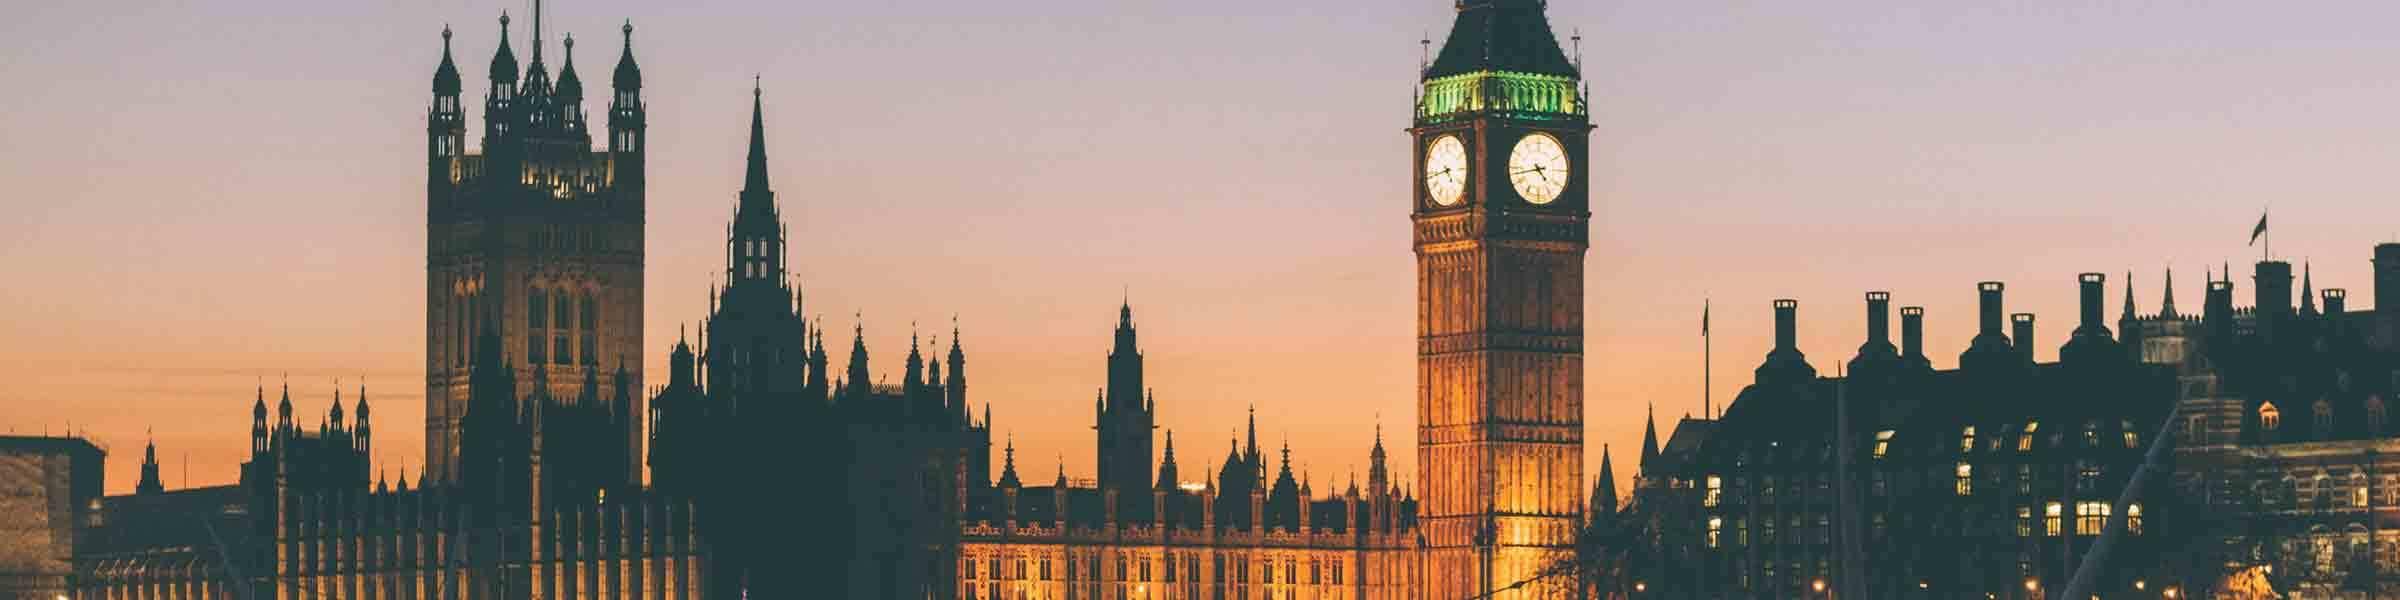 Westminster Sunset Header